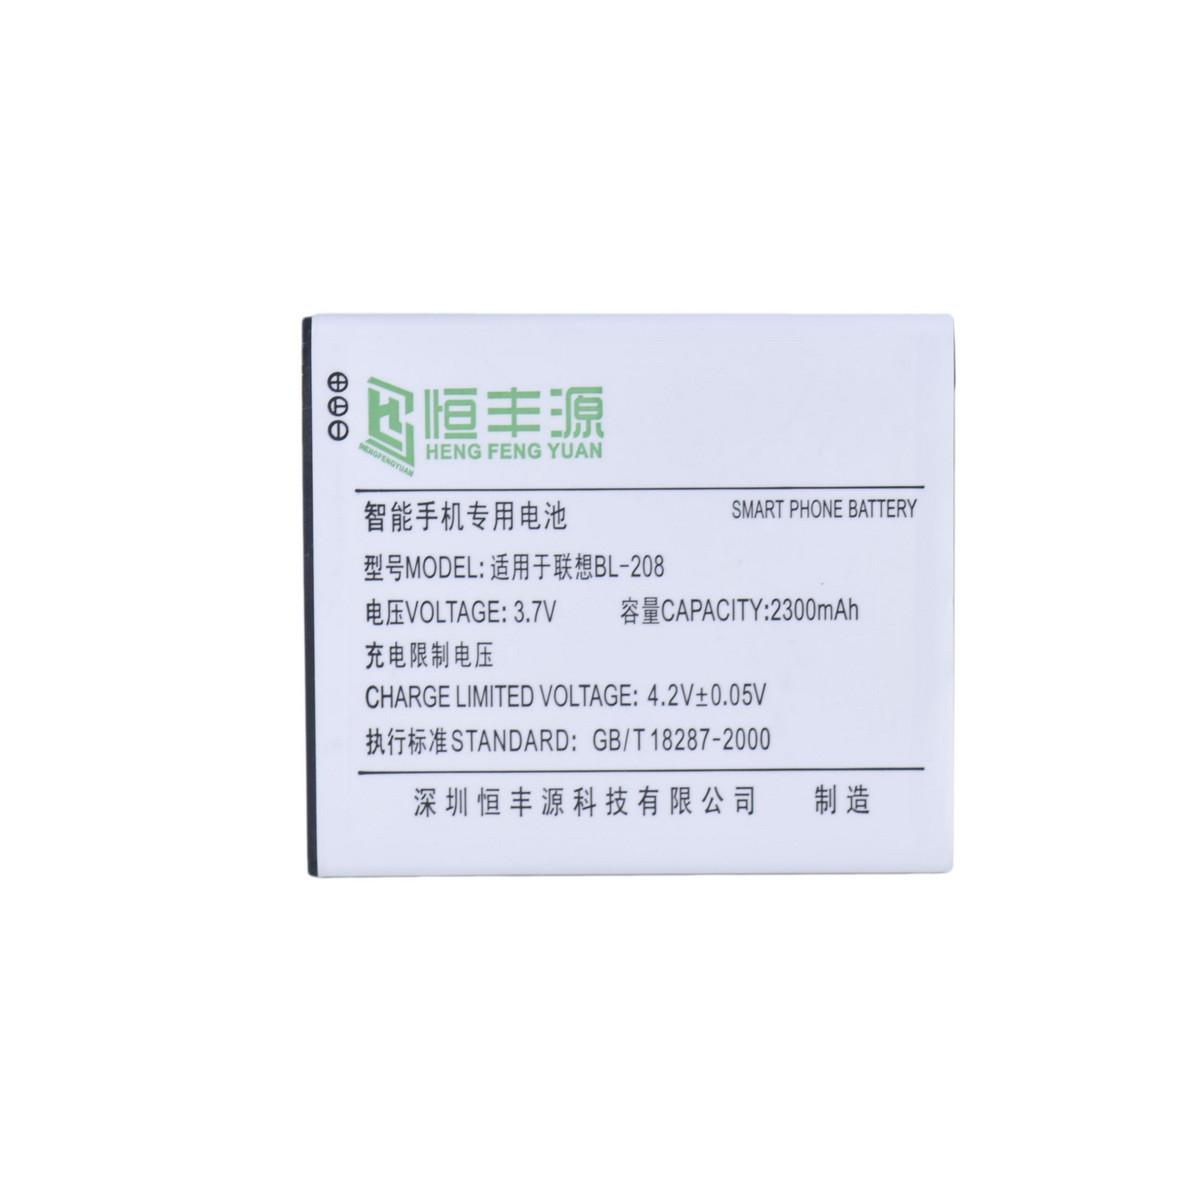 Аккумулятор Lenovo BL-208 S920 Heng Feng Yuan OEM